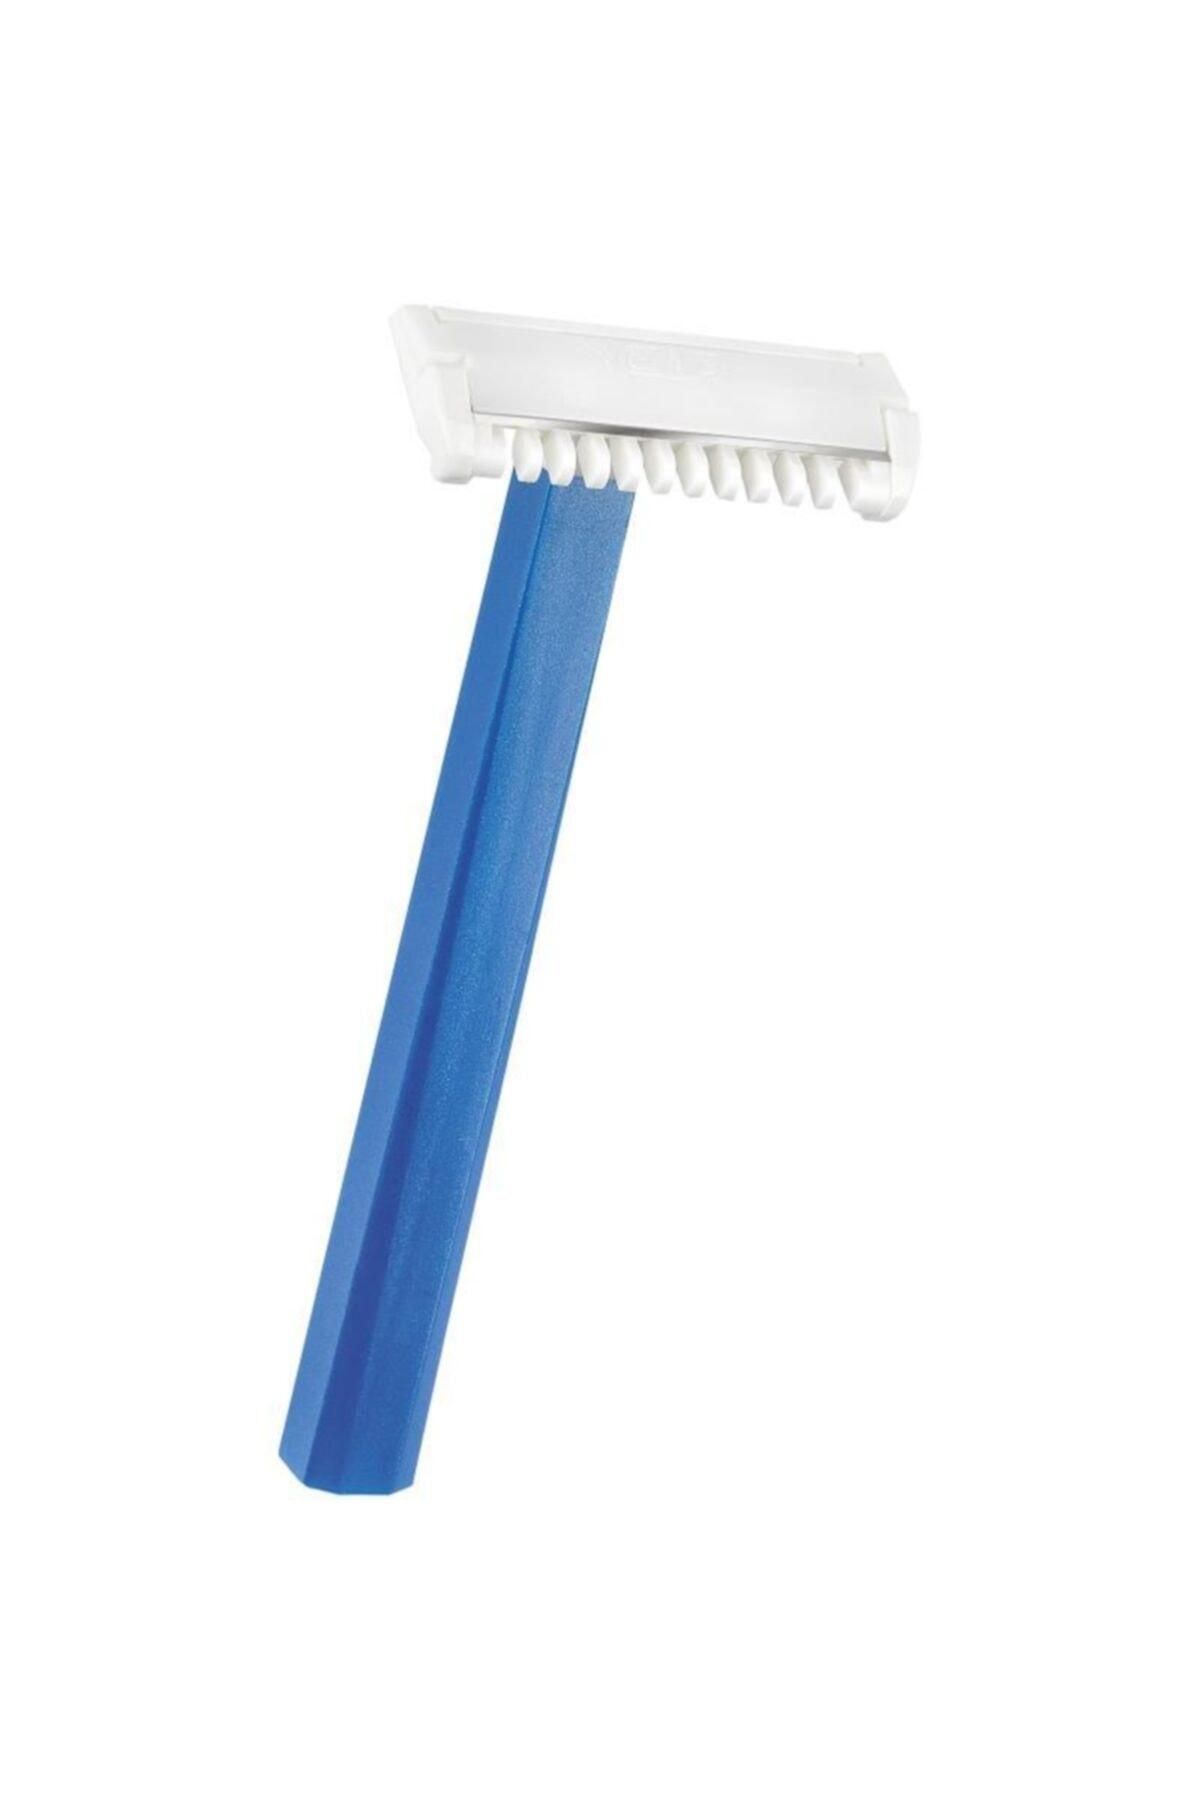 Bic Bıc Body Banyo Tıraş Bıçağı 12'li Poşet 2